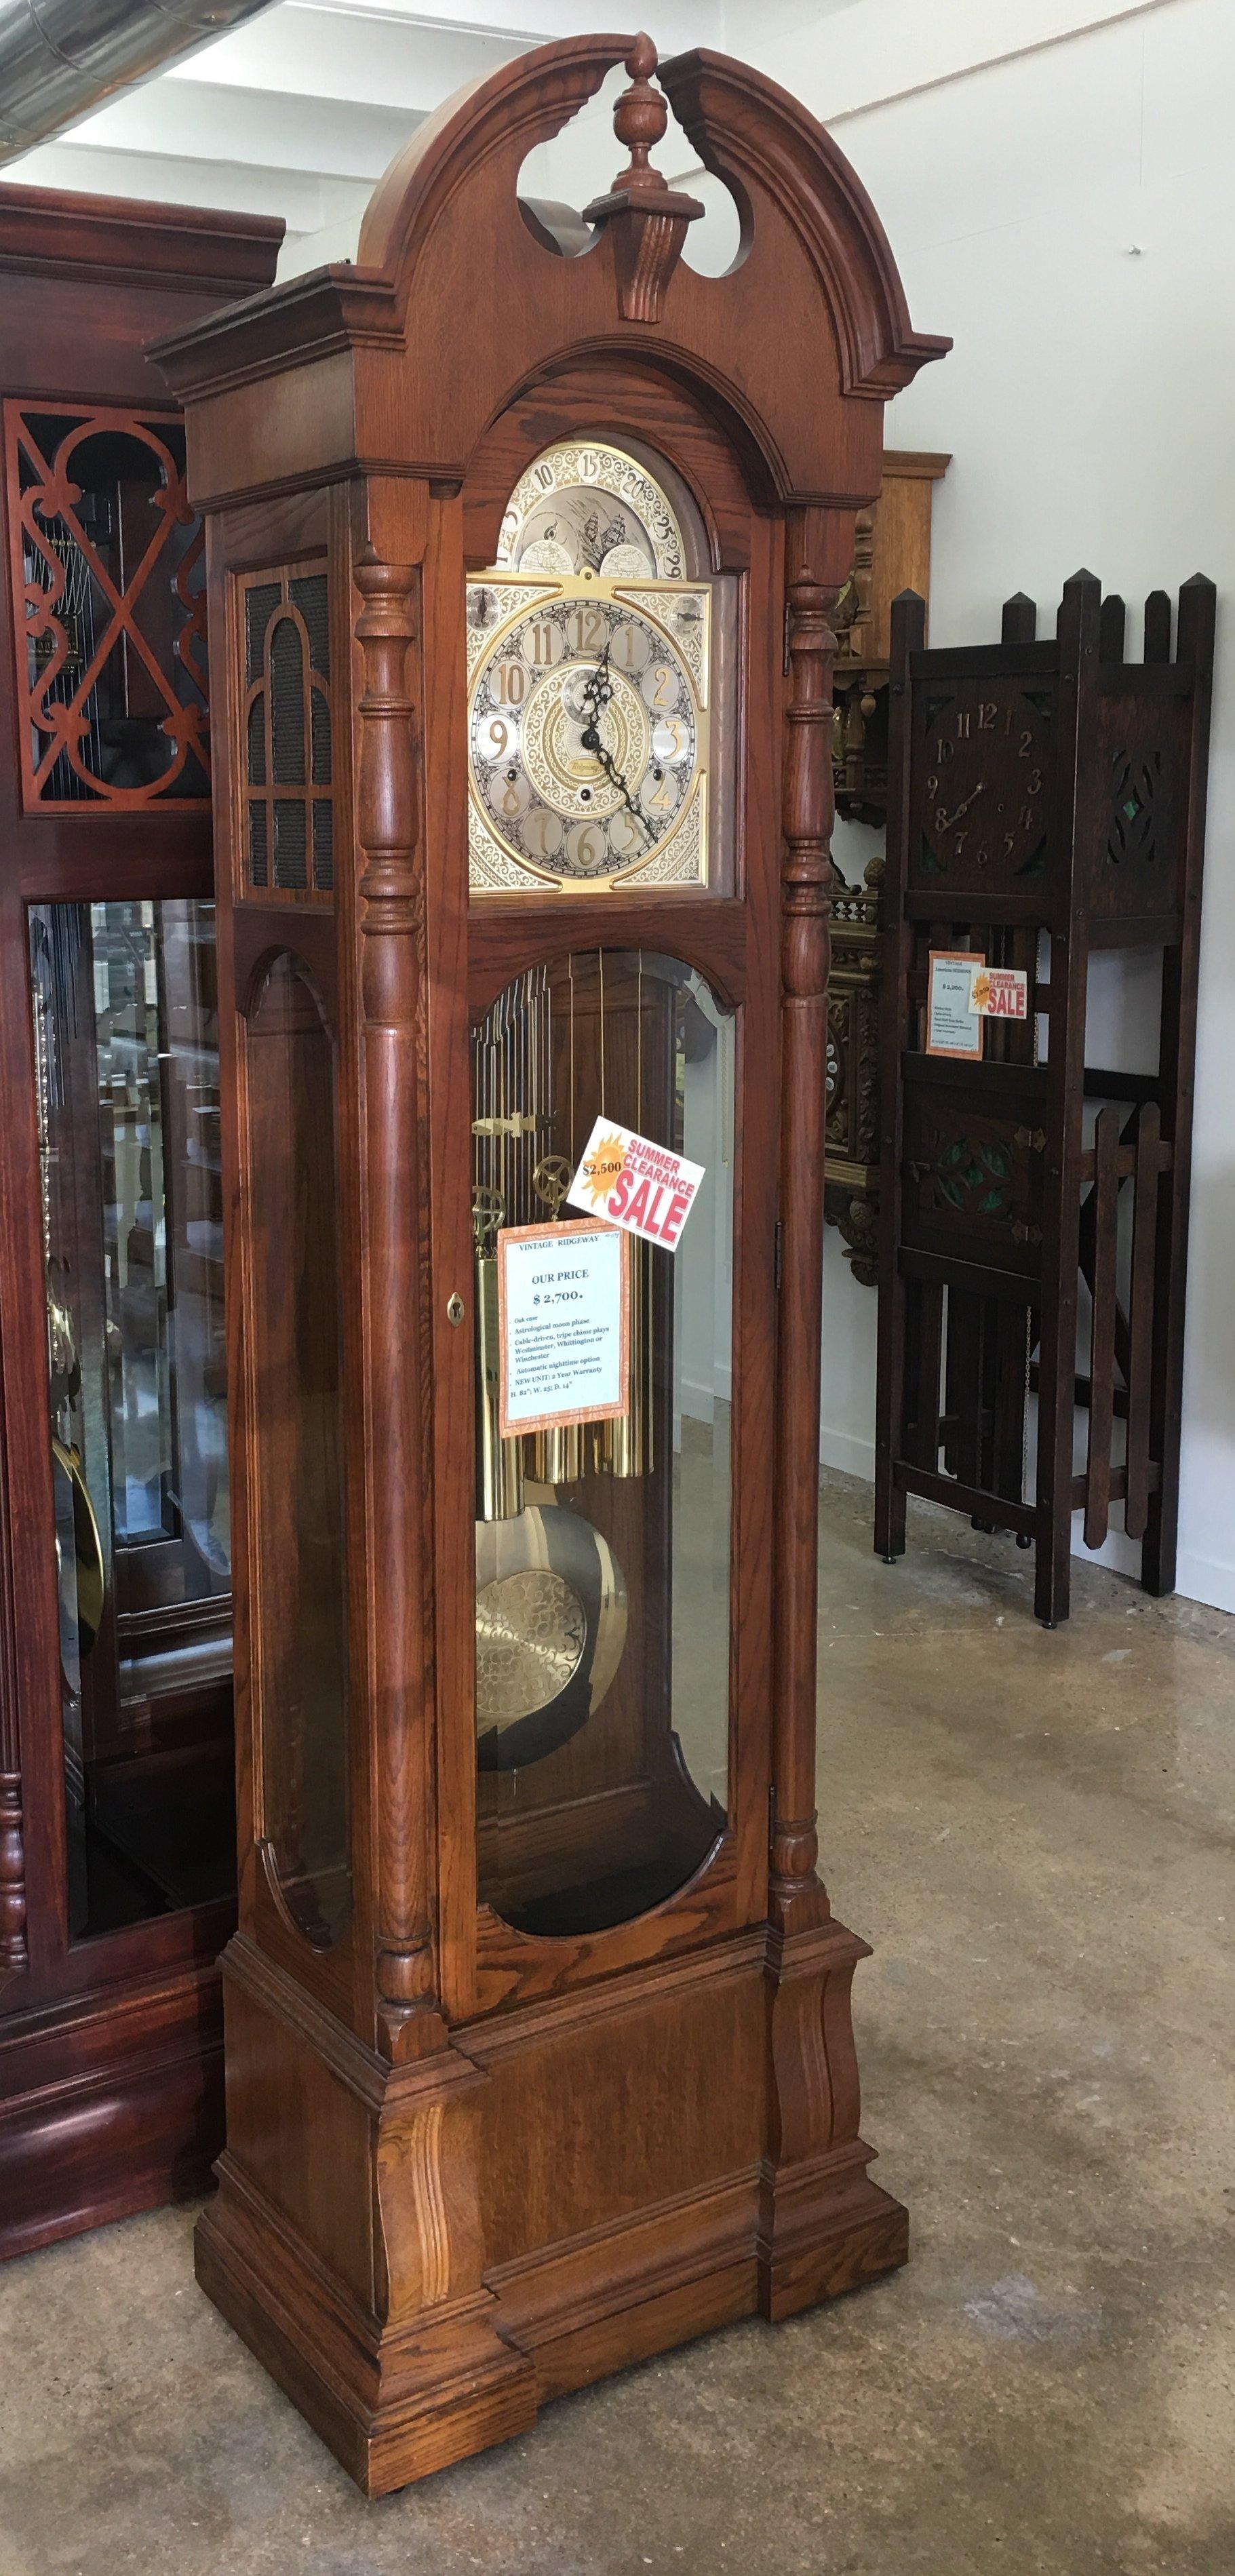 Clock Repairs and Sales   Austin, TX   McGuire's Clocks